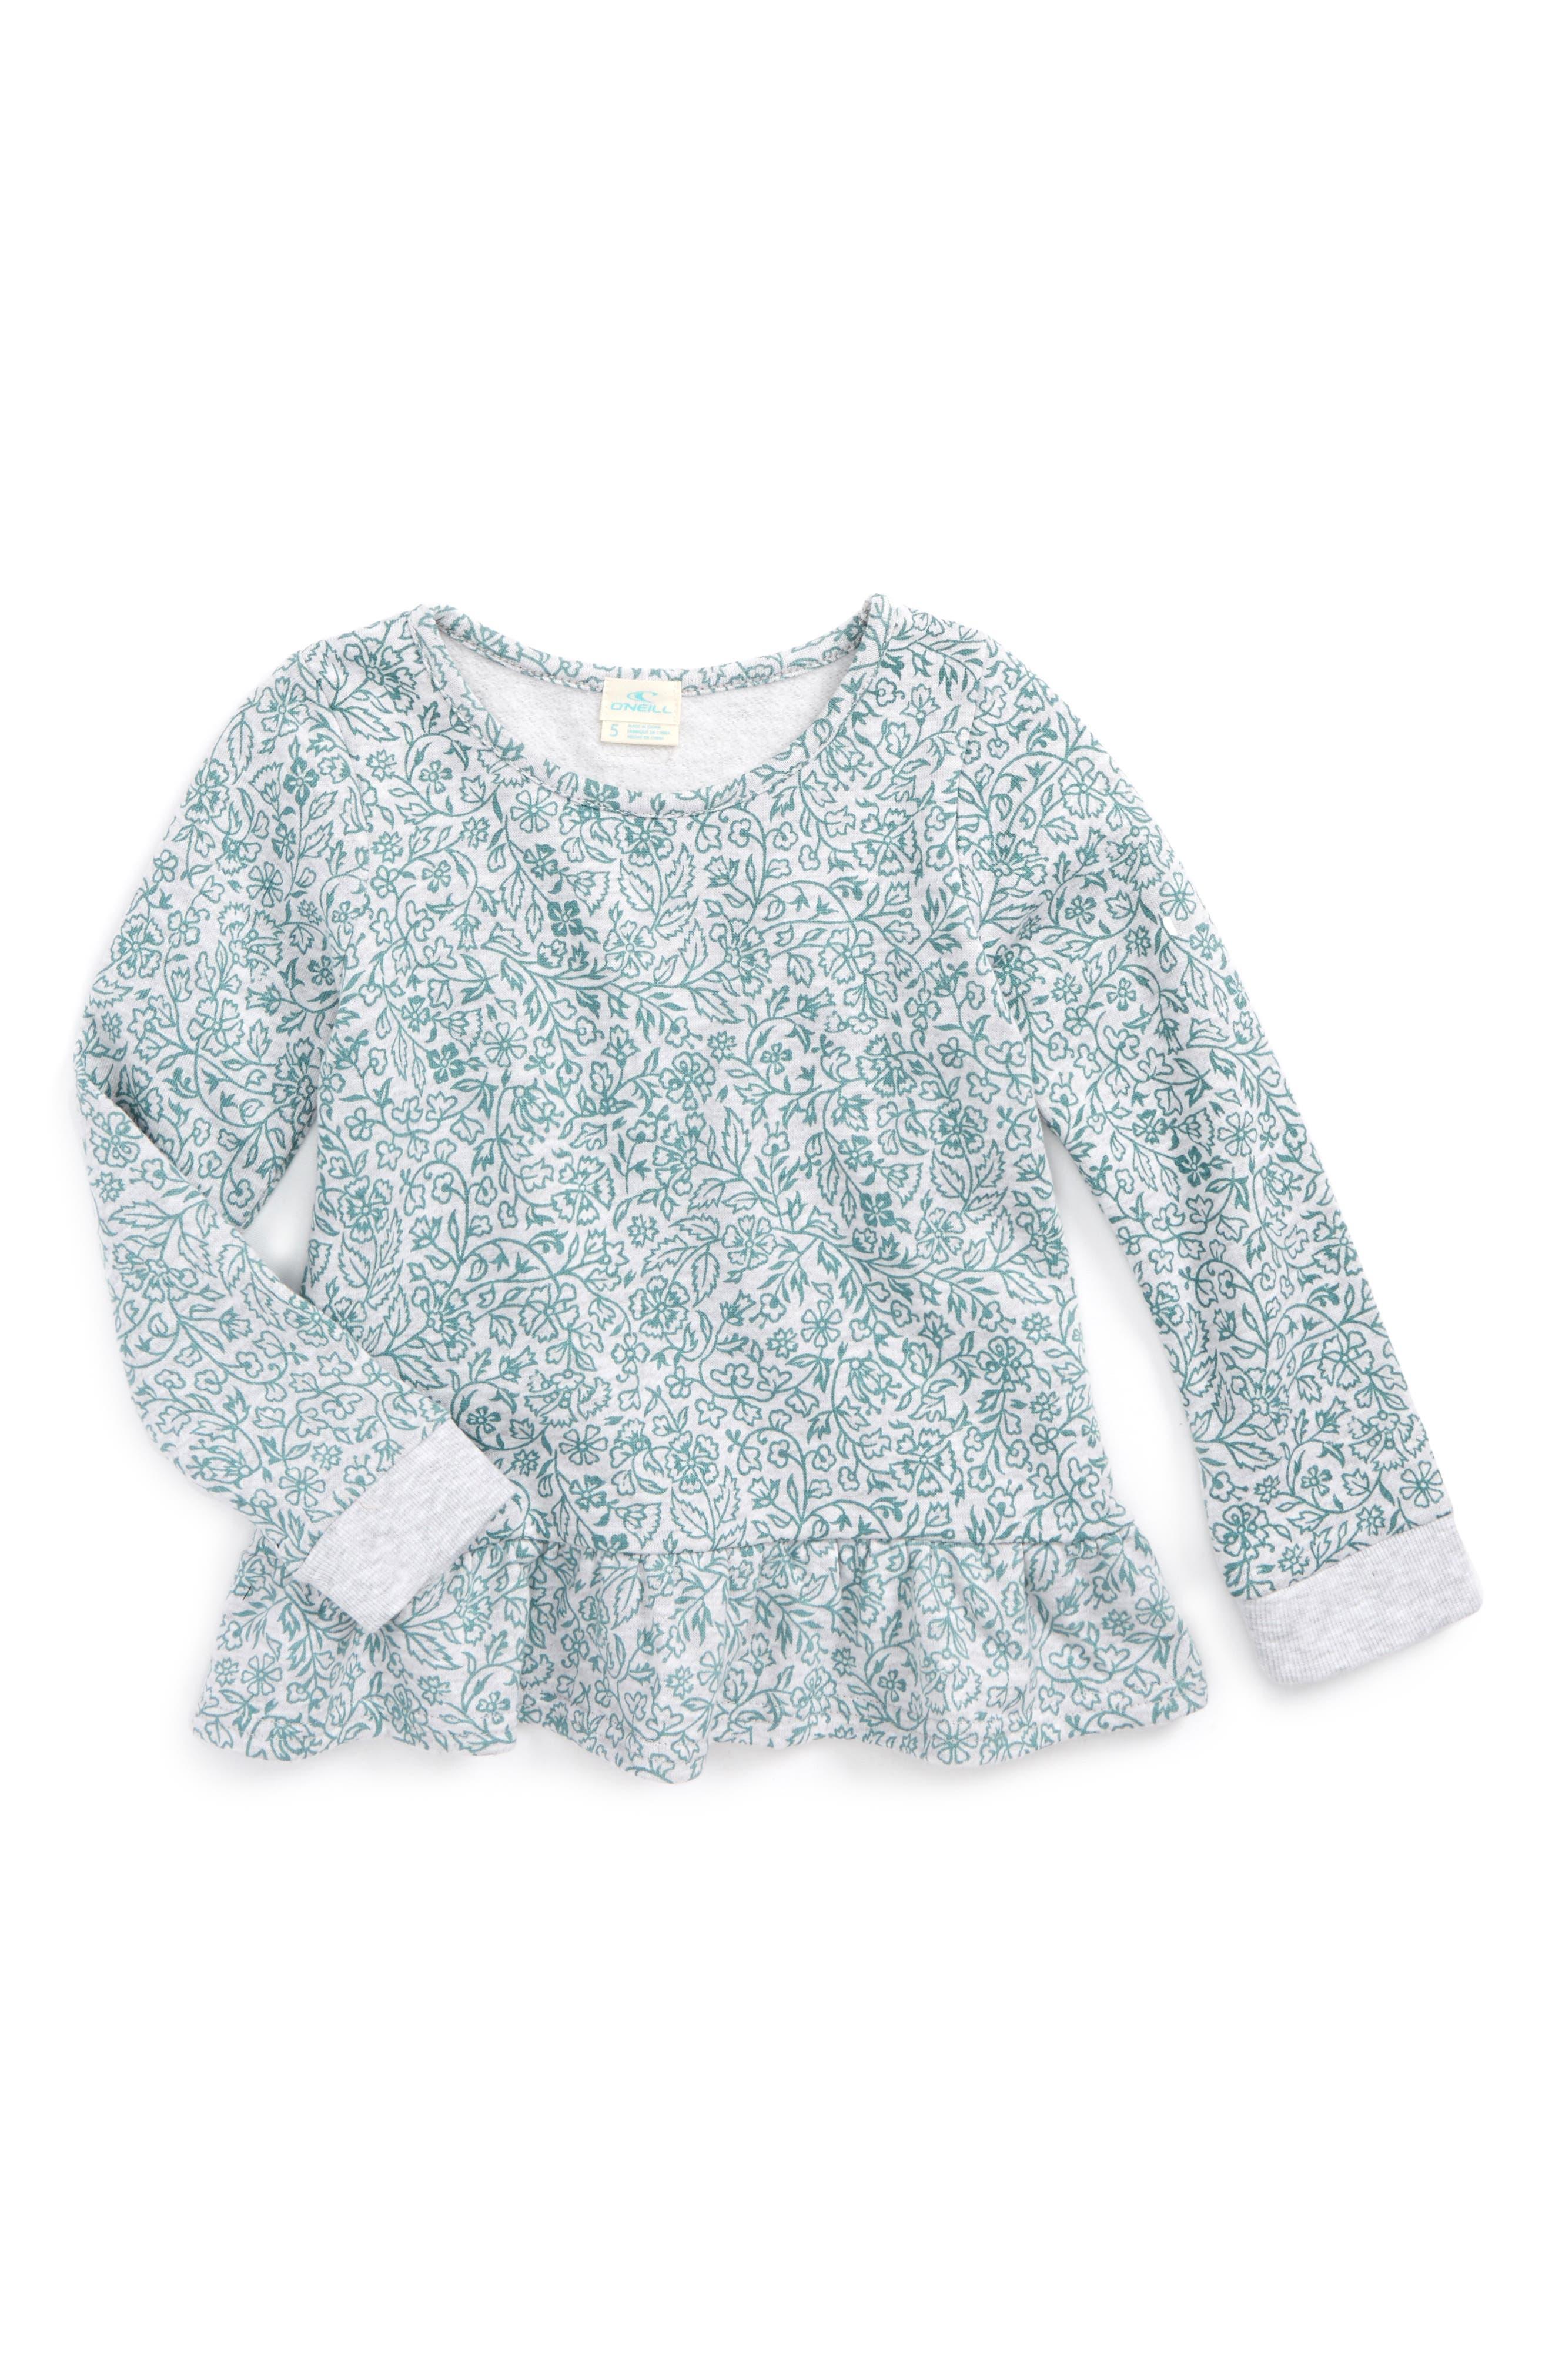 Loveland Fleece Sweatshirt,                         Main,                         color, Heather Grey - Hgr